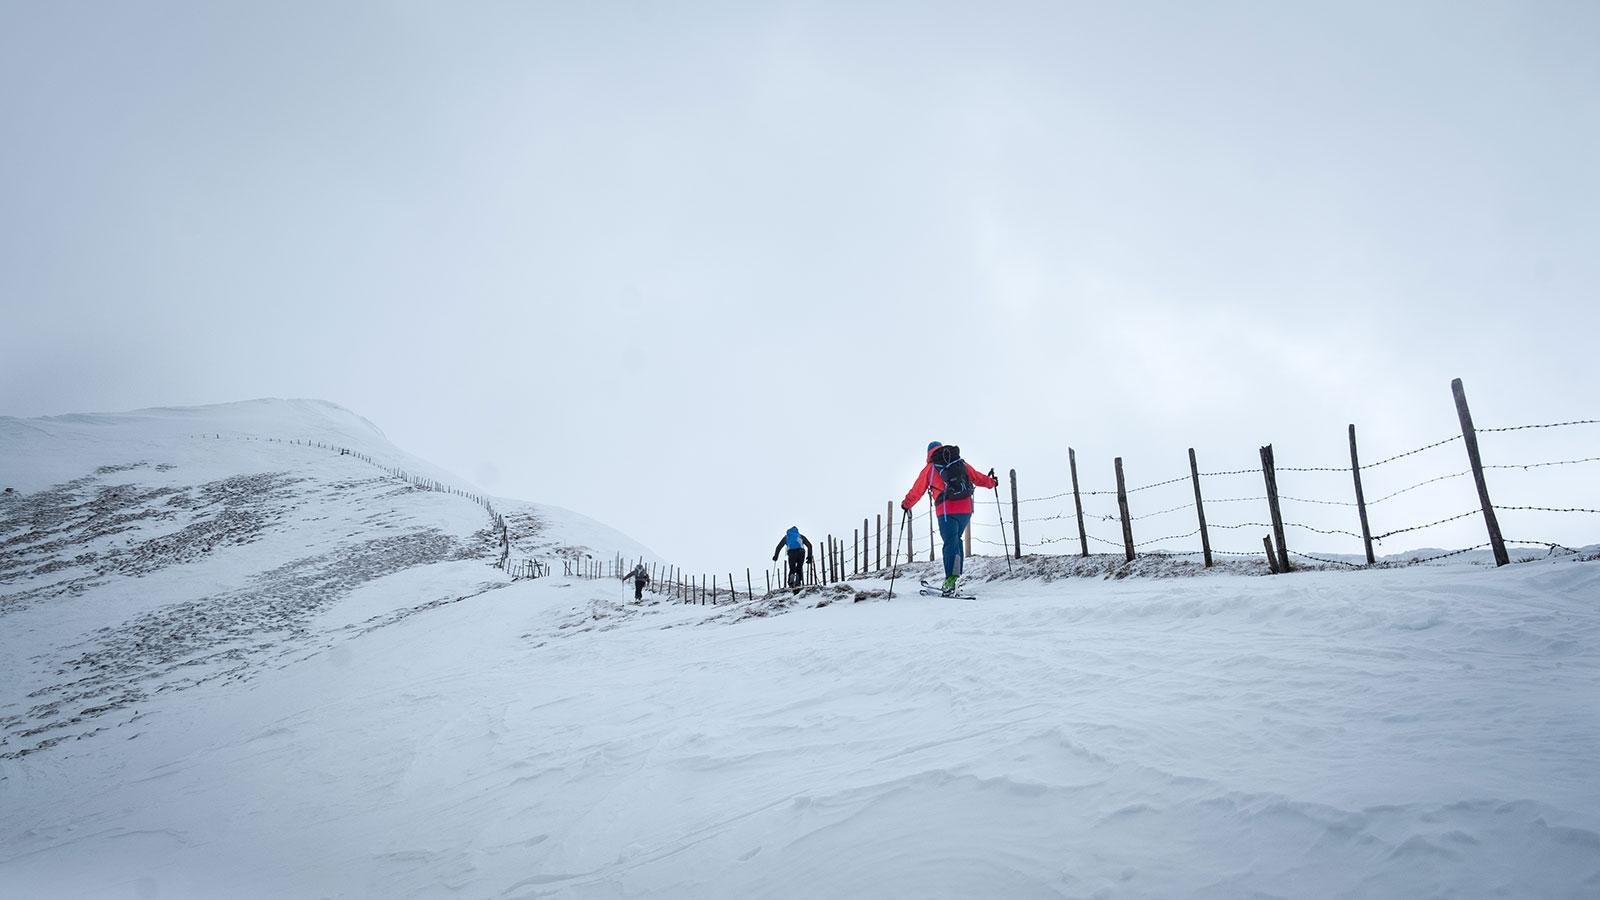 Zaun. Skitour in Südtirol | Pauli Trenkwalder, Berge & Psychologie